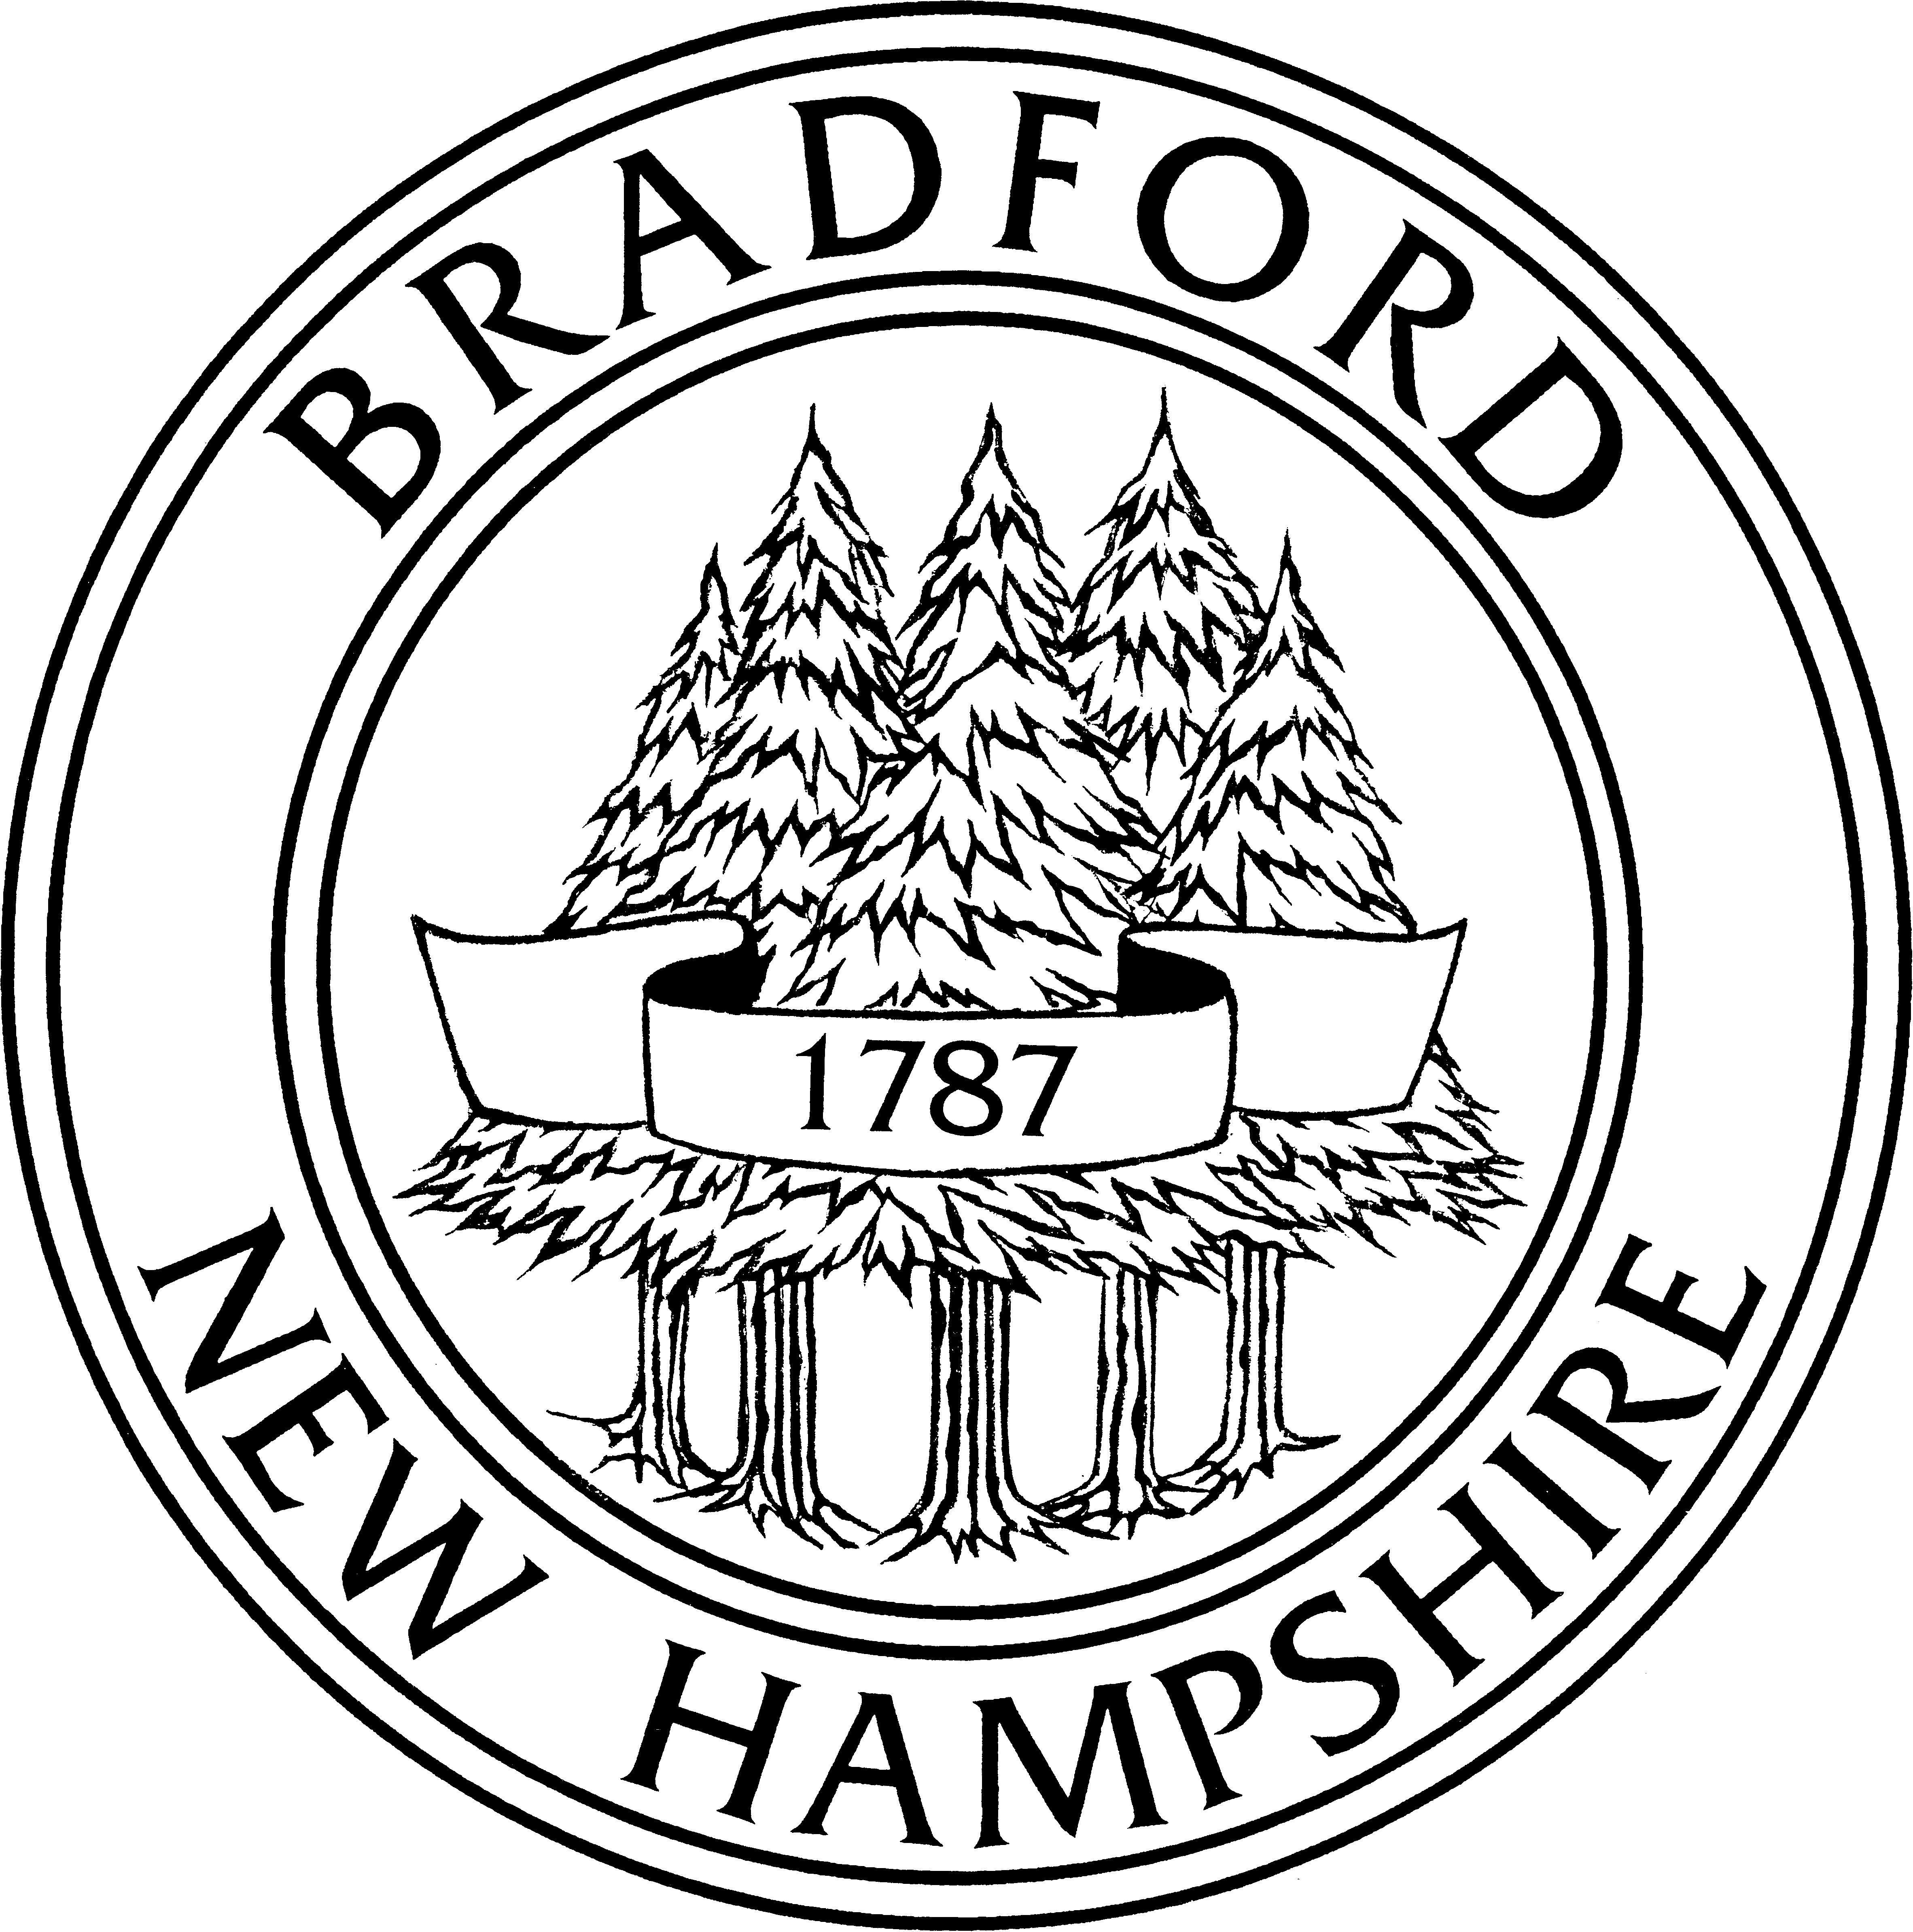 Bradford New Hampshire